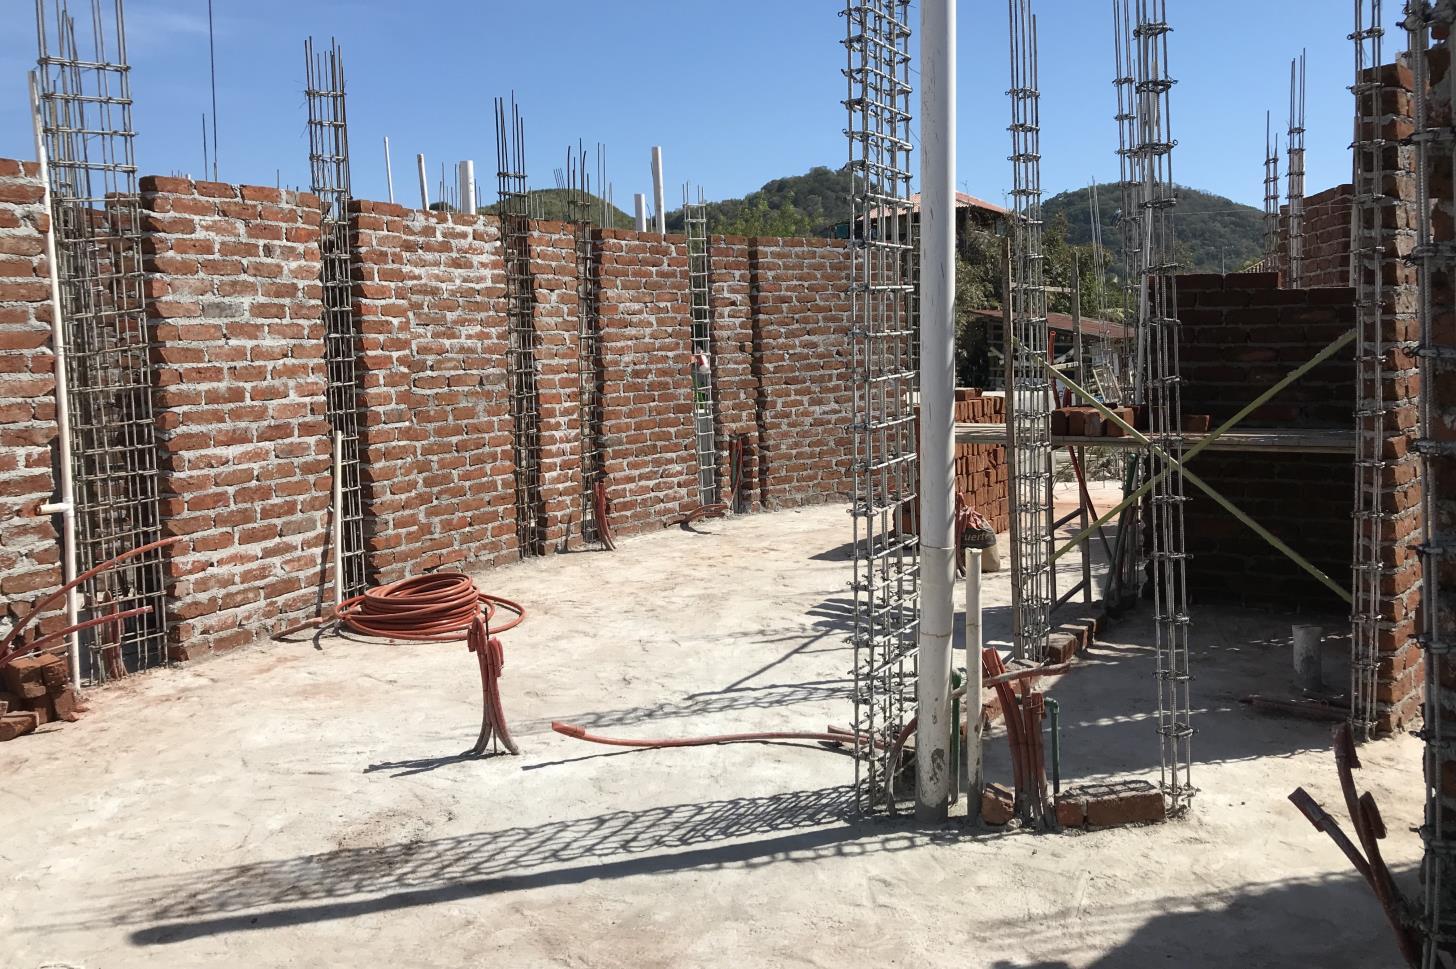 REPORTE-FOTOGRAFICO-PUNTA-MAJAHUA-26-DE-ENERO-DEL-2019-029.jpg